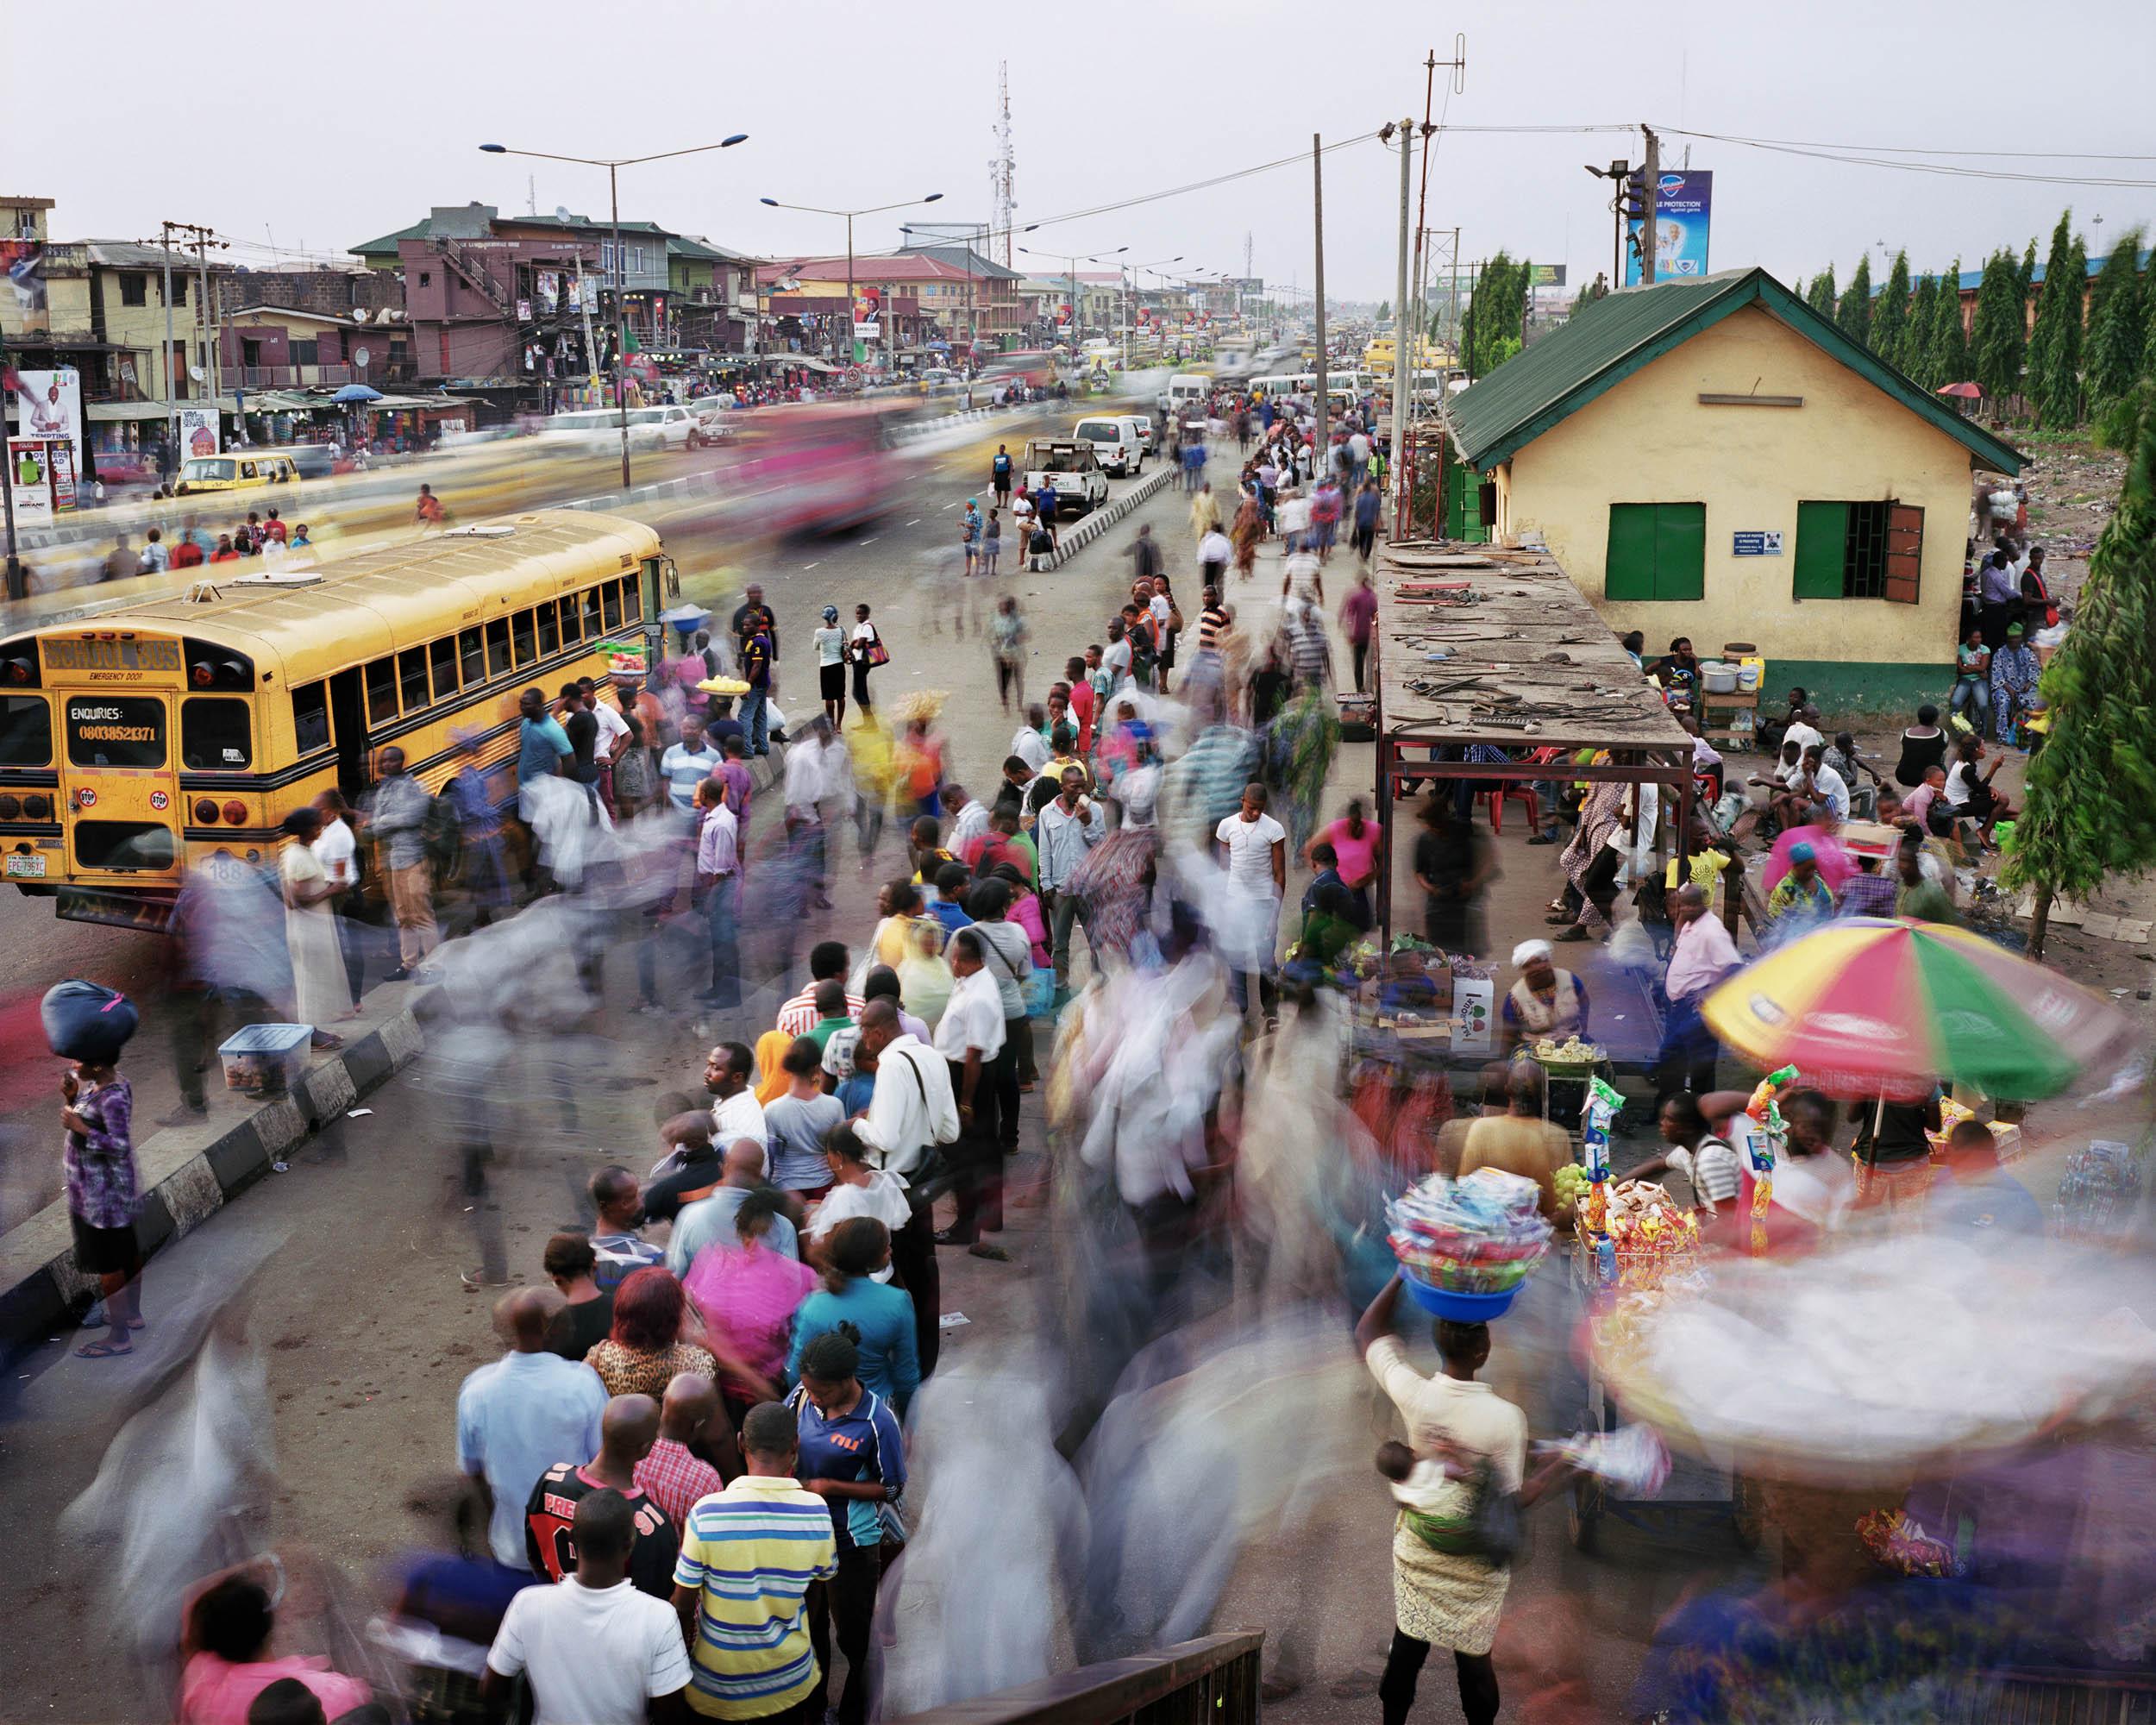 Agege Motor Road, Oshodi, Lagos, Nigeria